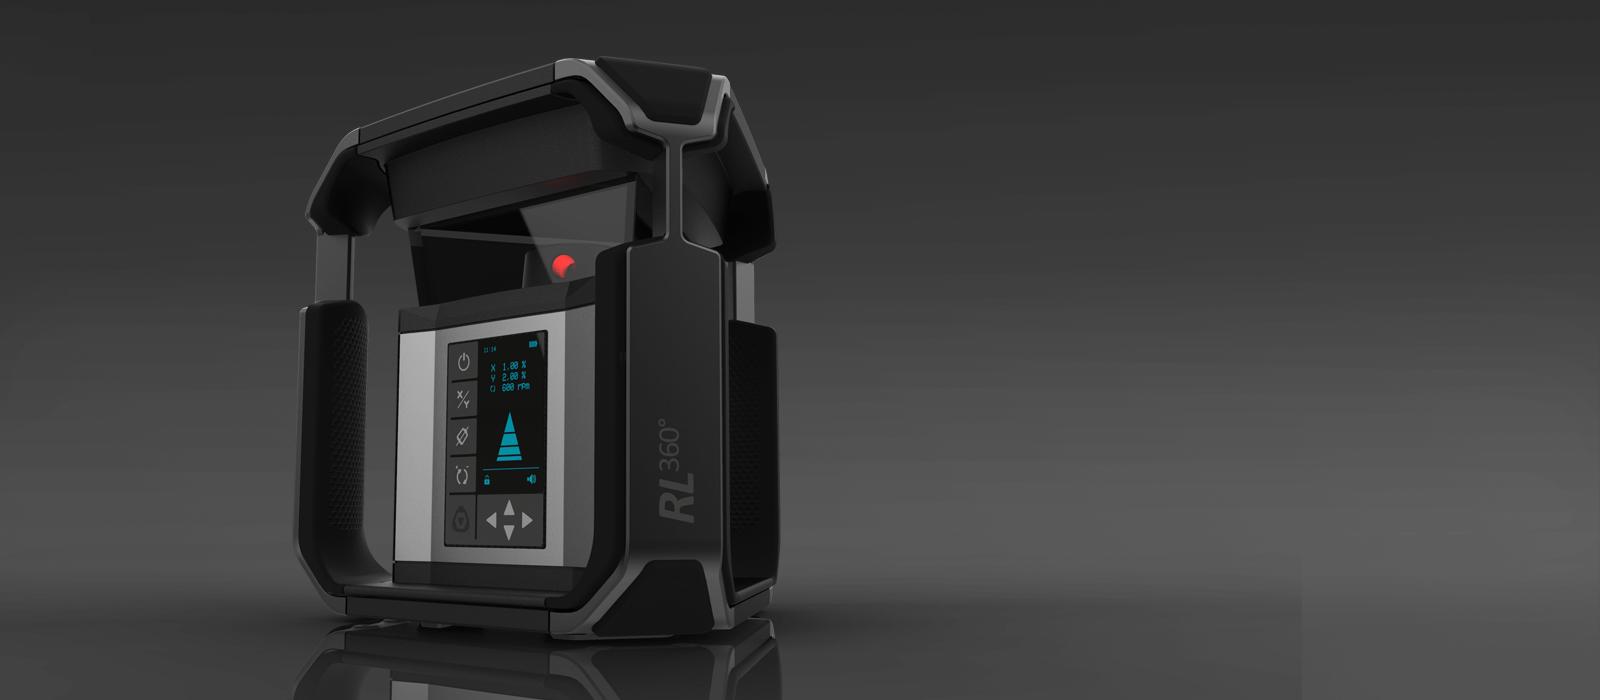 RL360 Rotary laser